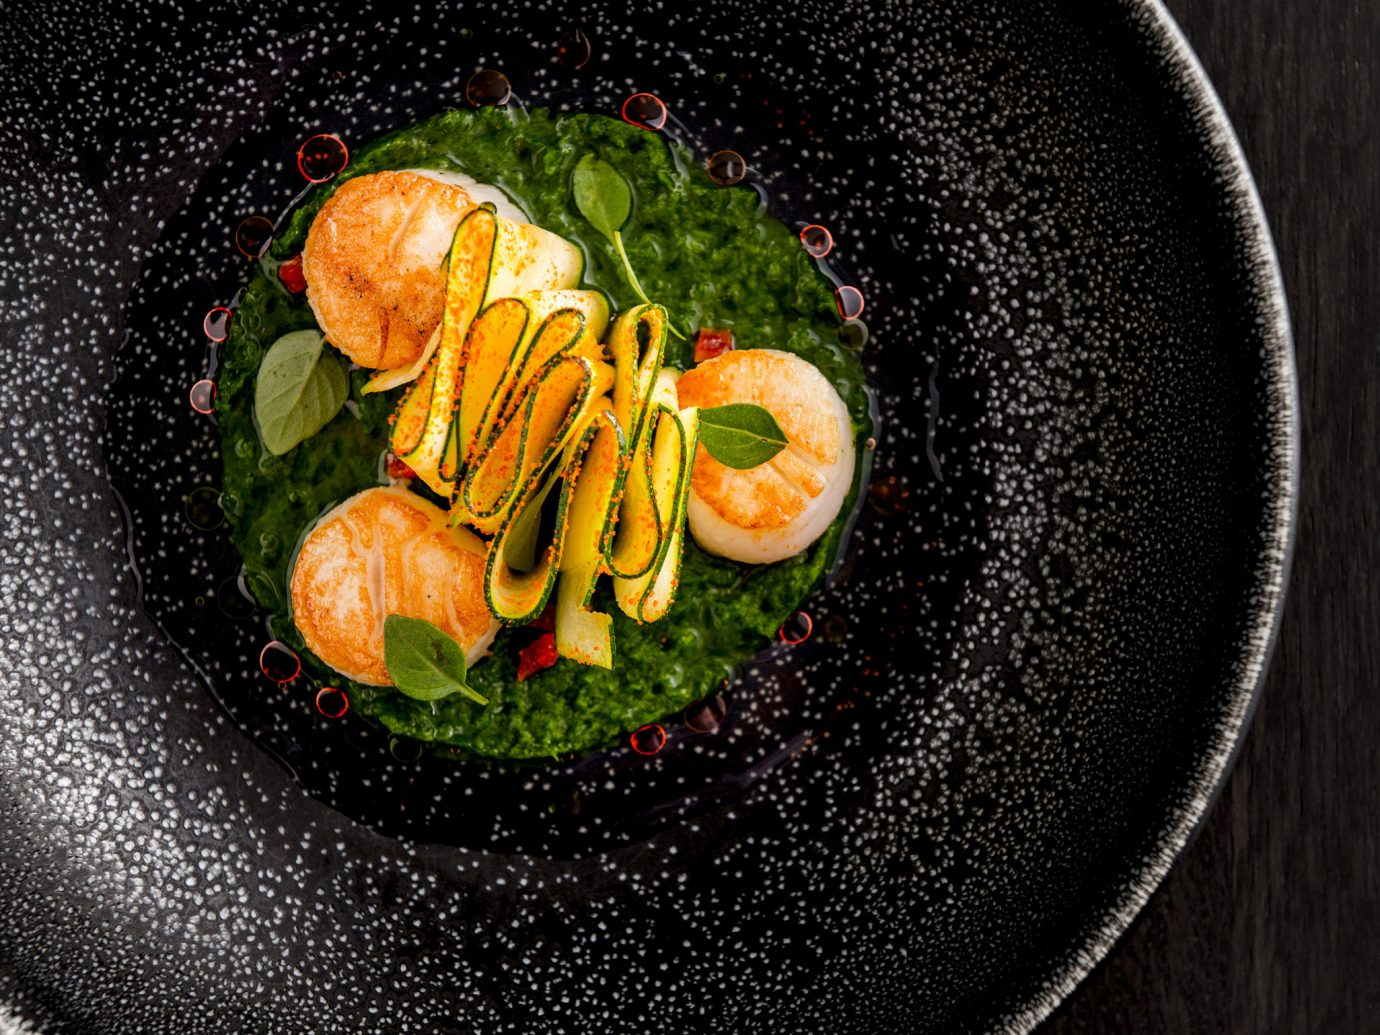 Food + Drink food produce cuisine dark